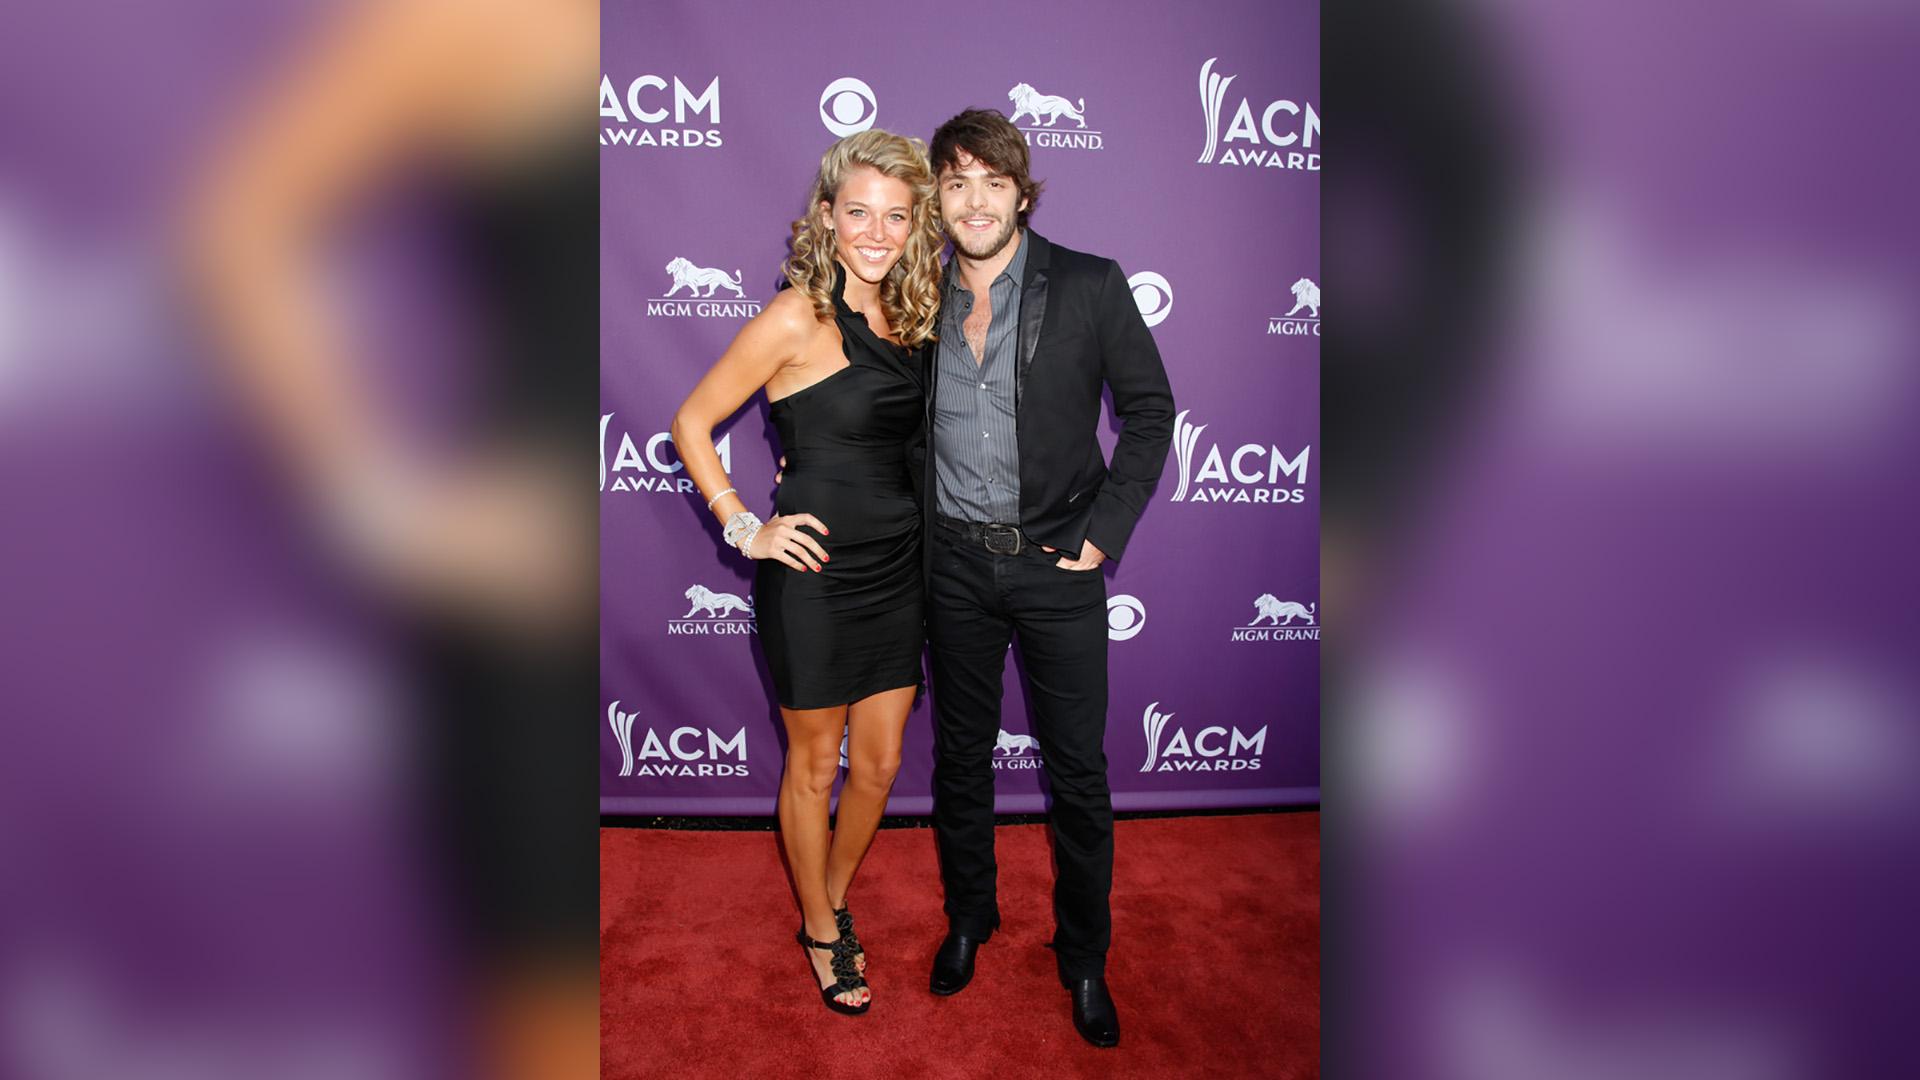 Thomas Rhett poses with his wife, Lauren Akins, in 2012.